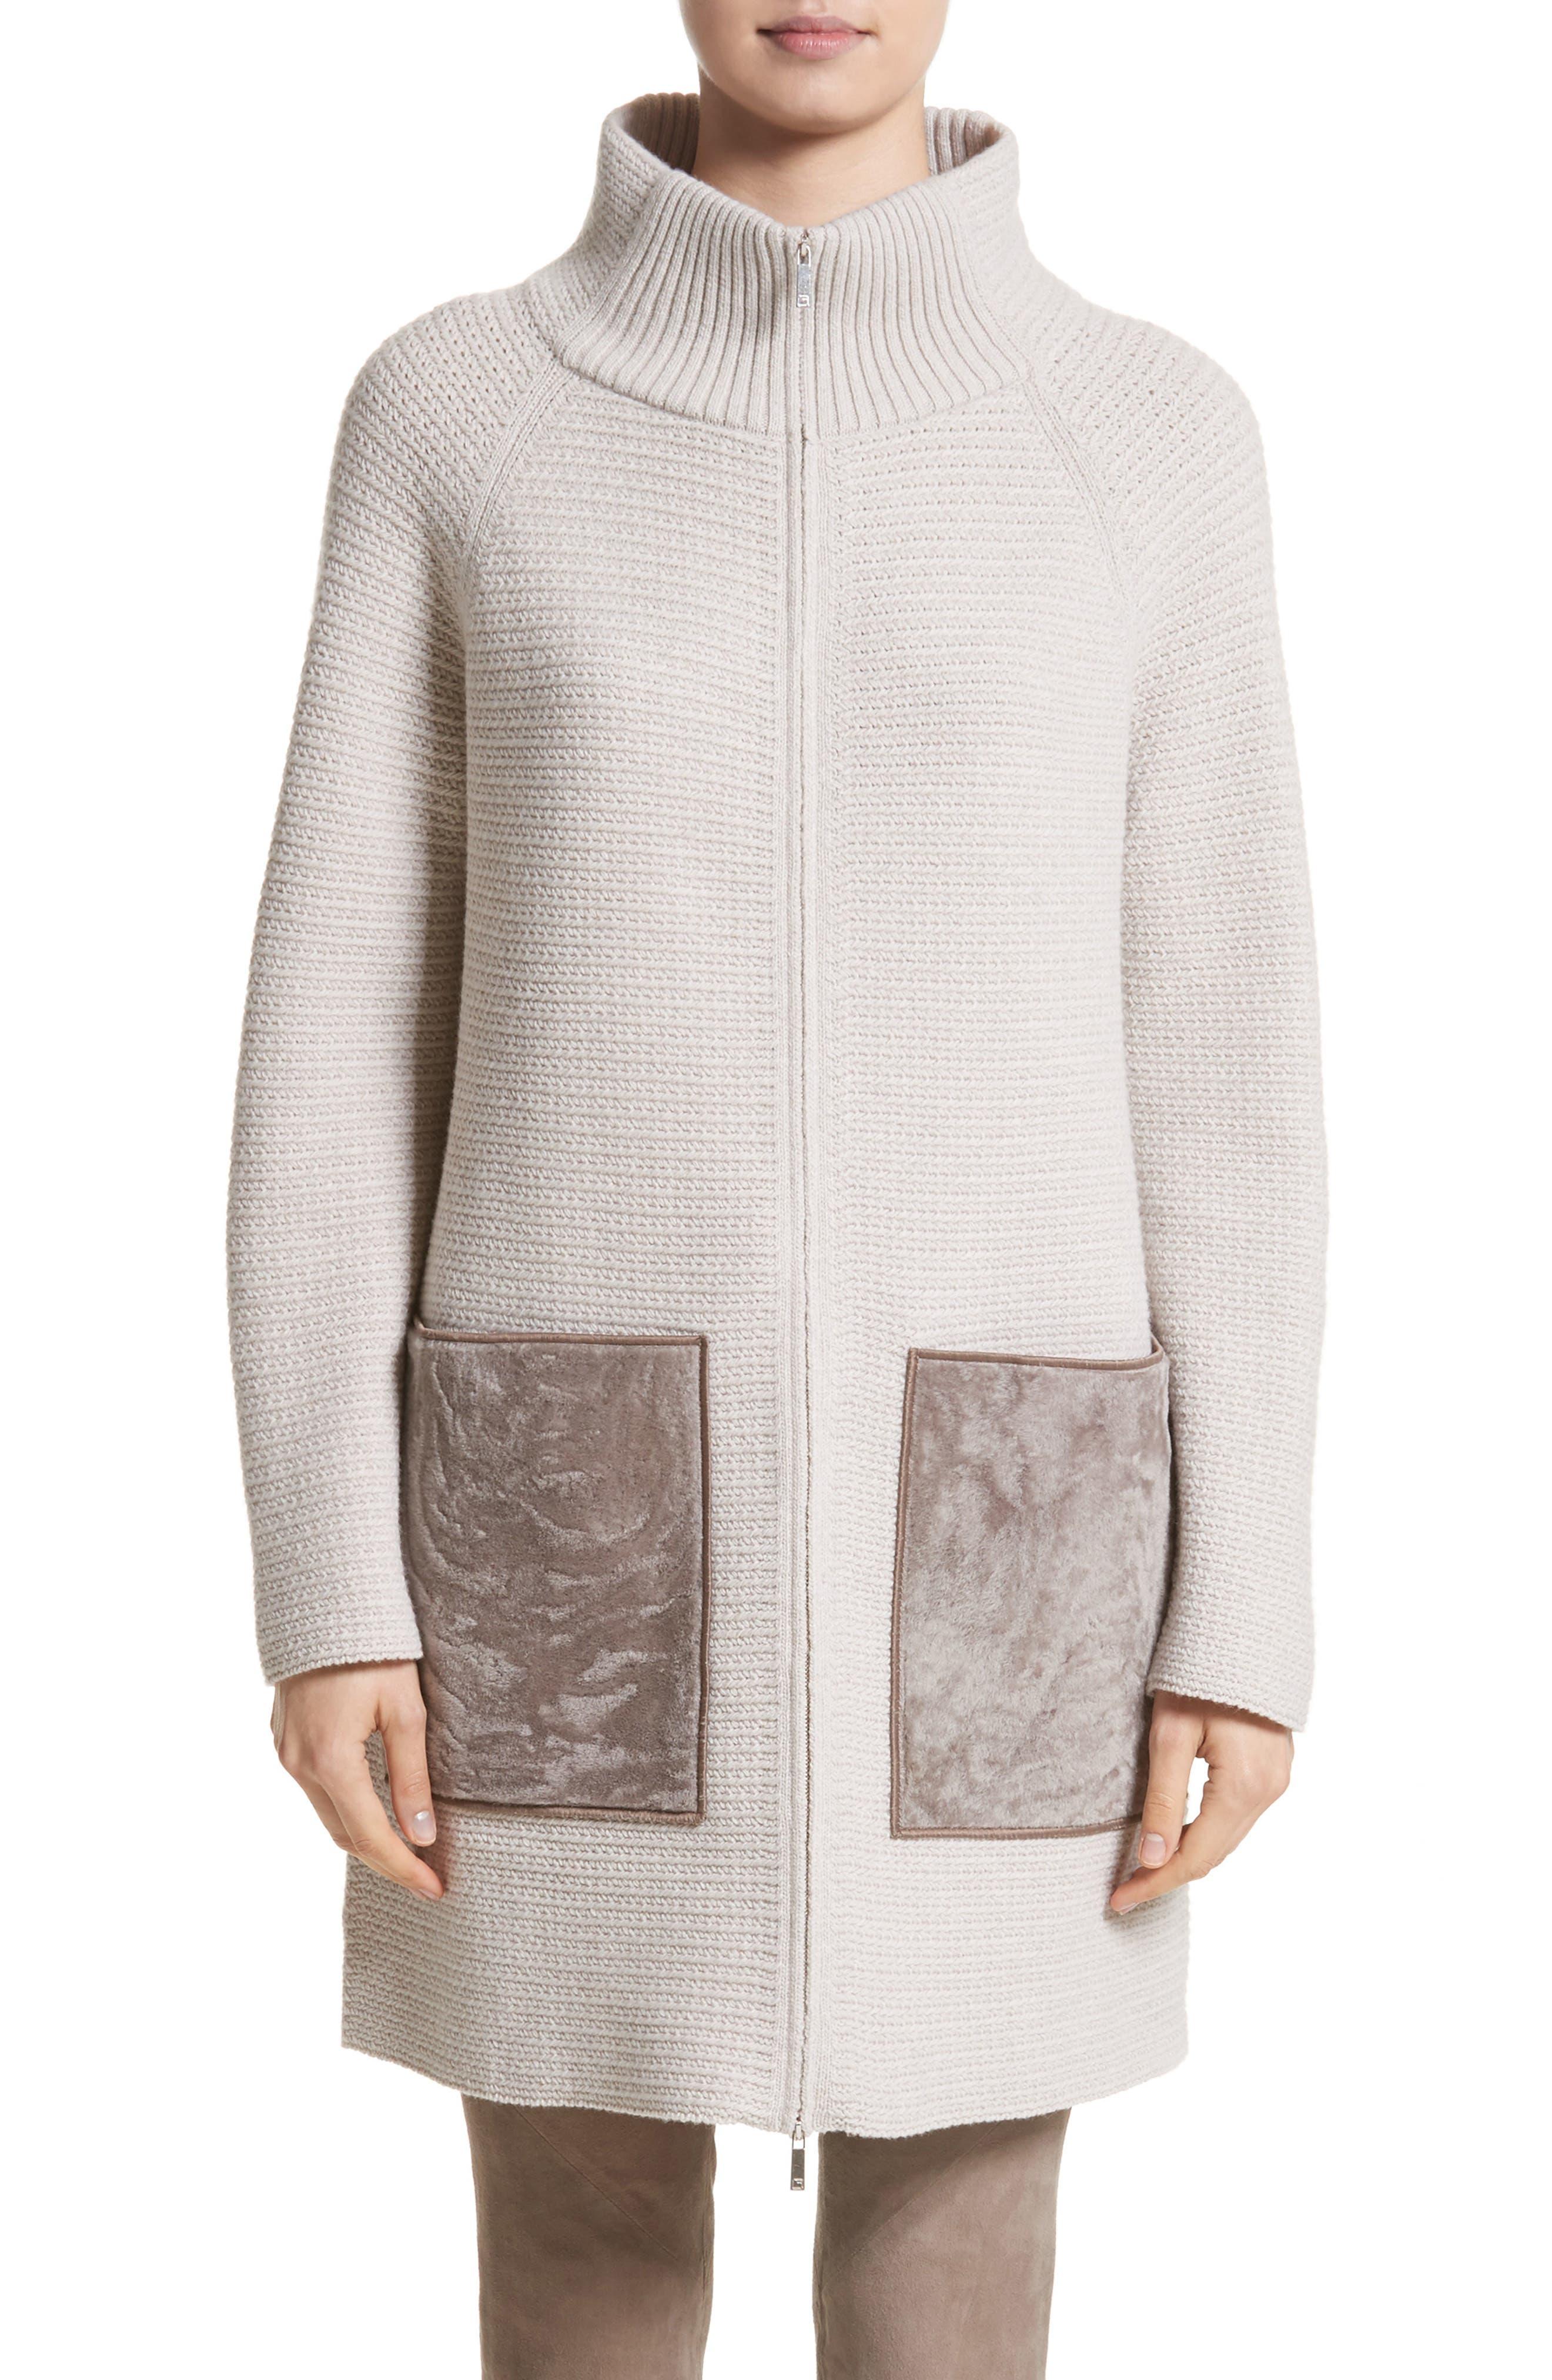 Lafayette 148 New York Wool & Cashmere Herringbone Stitch Cardigan with Genuine Shearling Pockets